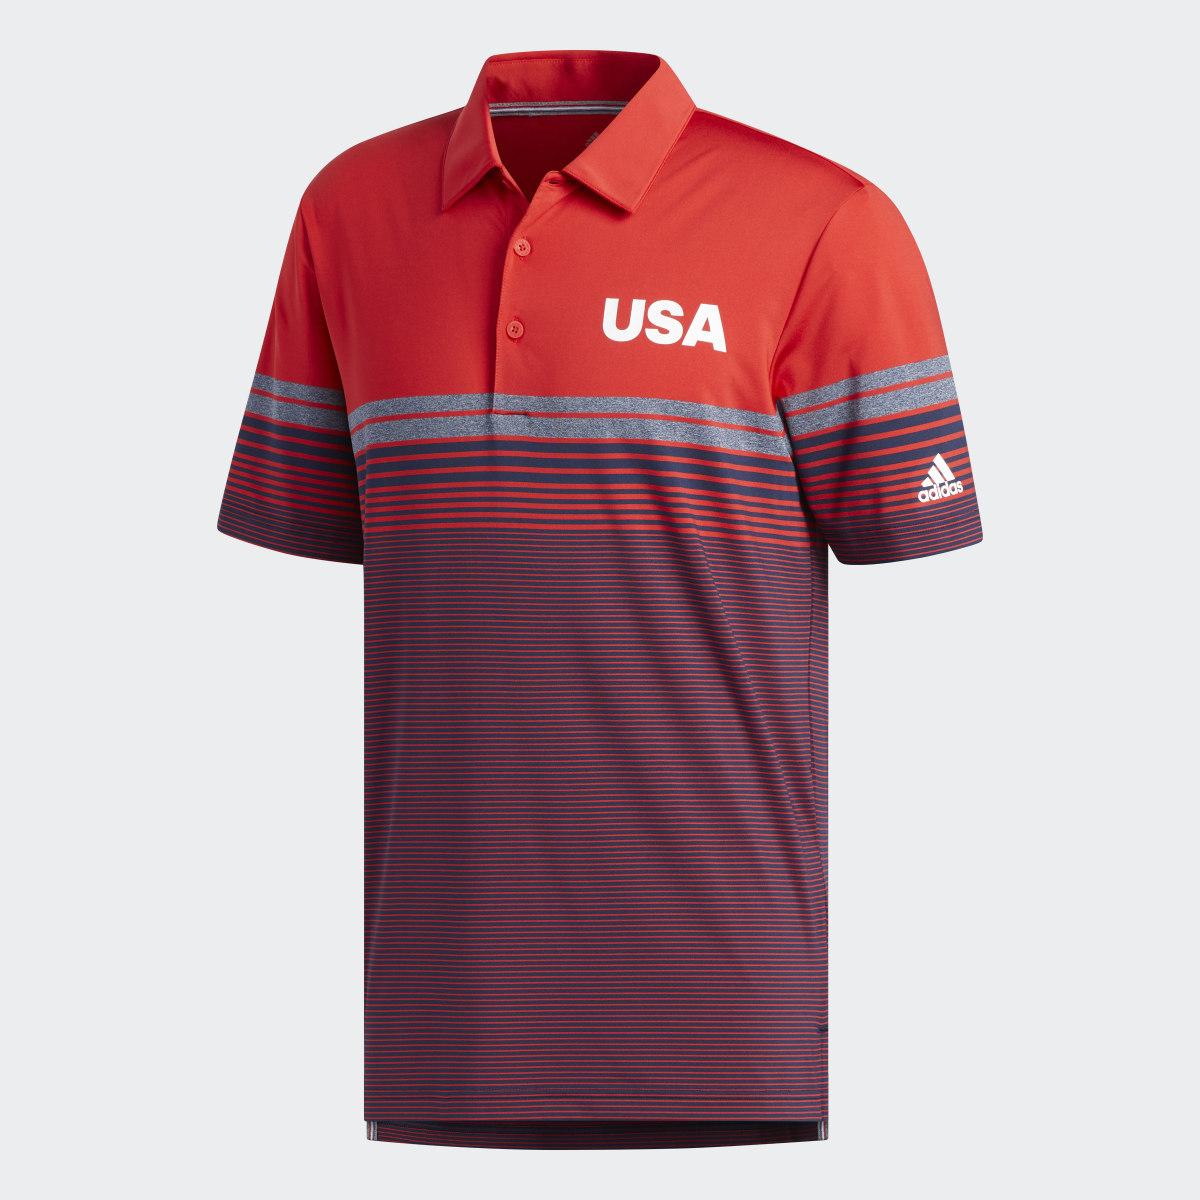 Adidas Men's USA Golf Ultimate365 Stripe Polo